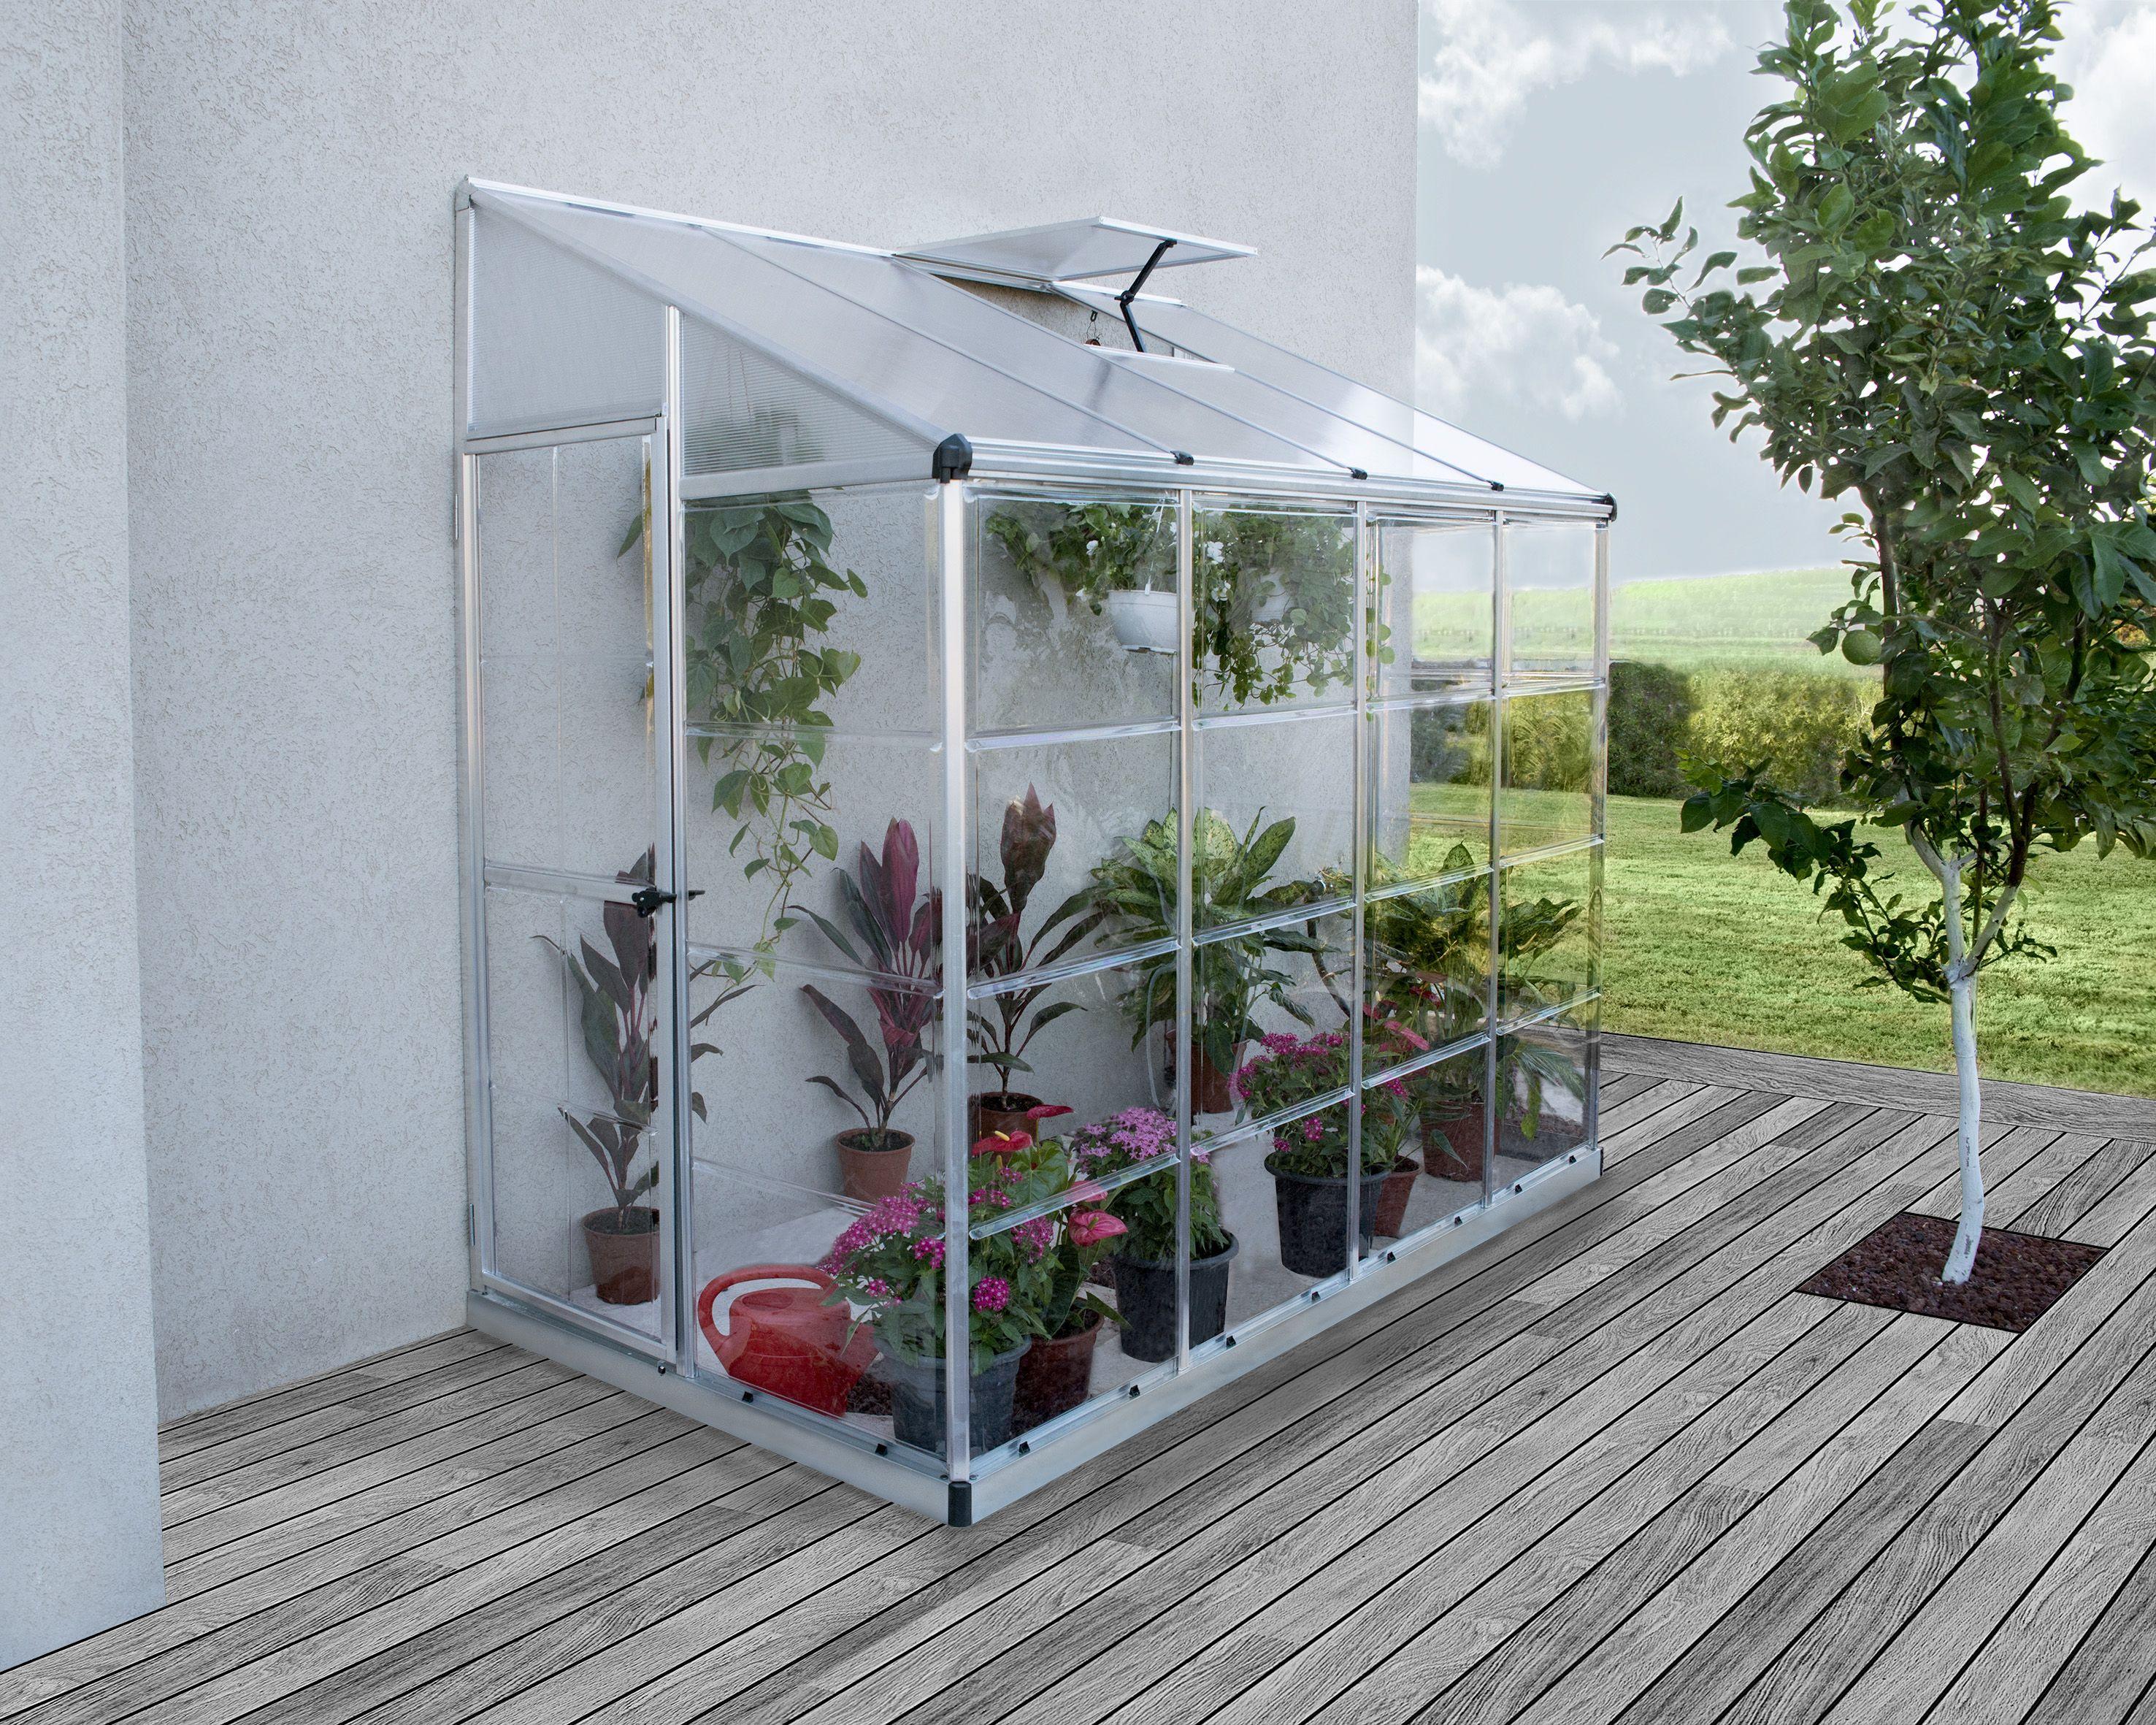 Palram Leanto Grow House 4x8 Greenhouse, Vertical herb